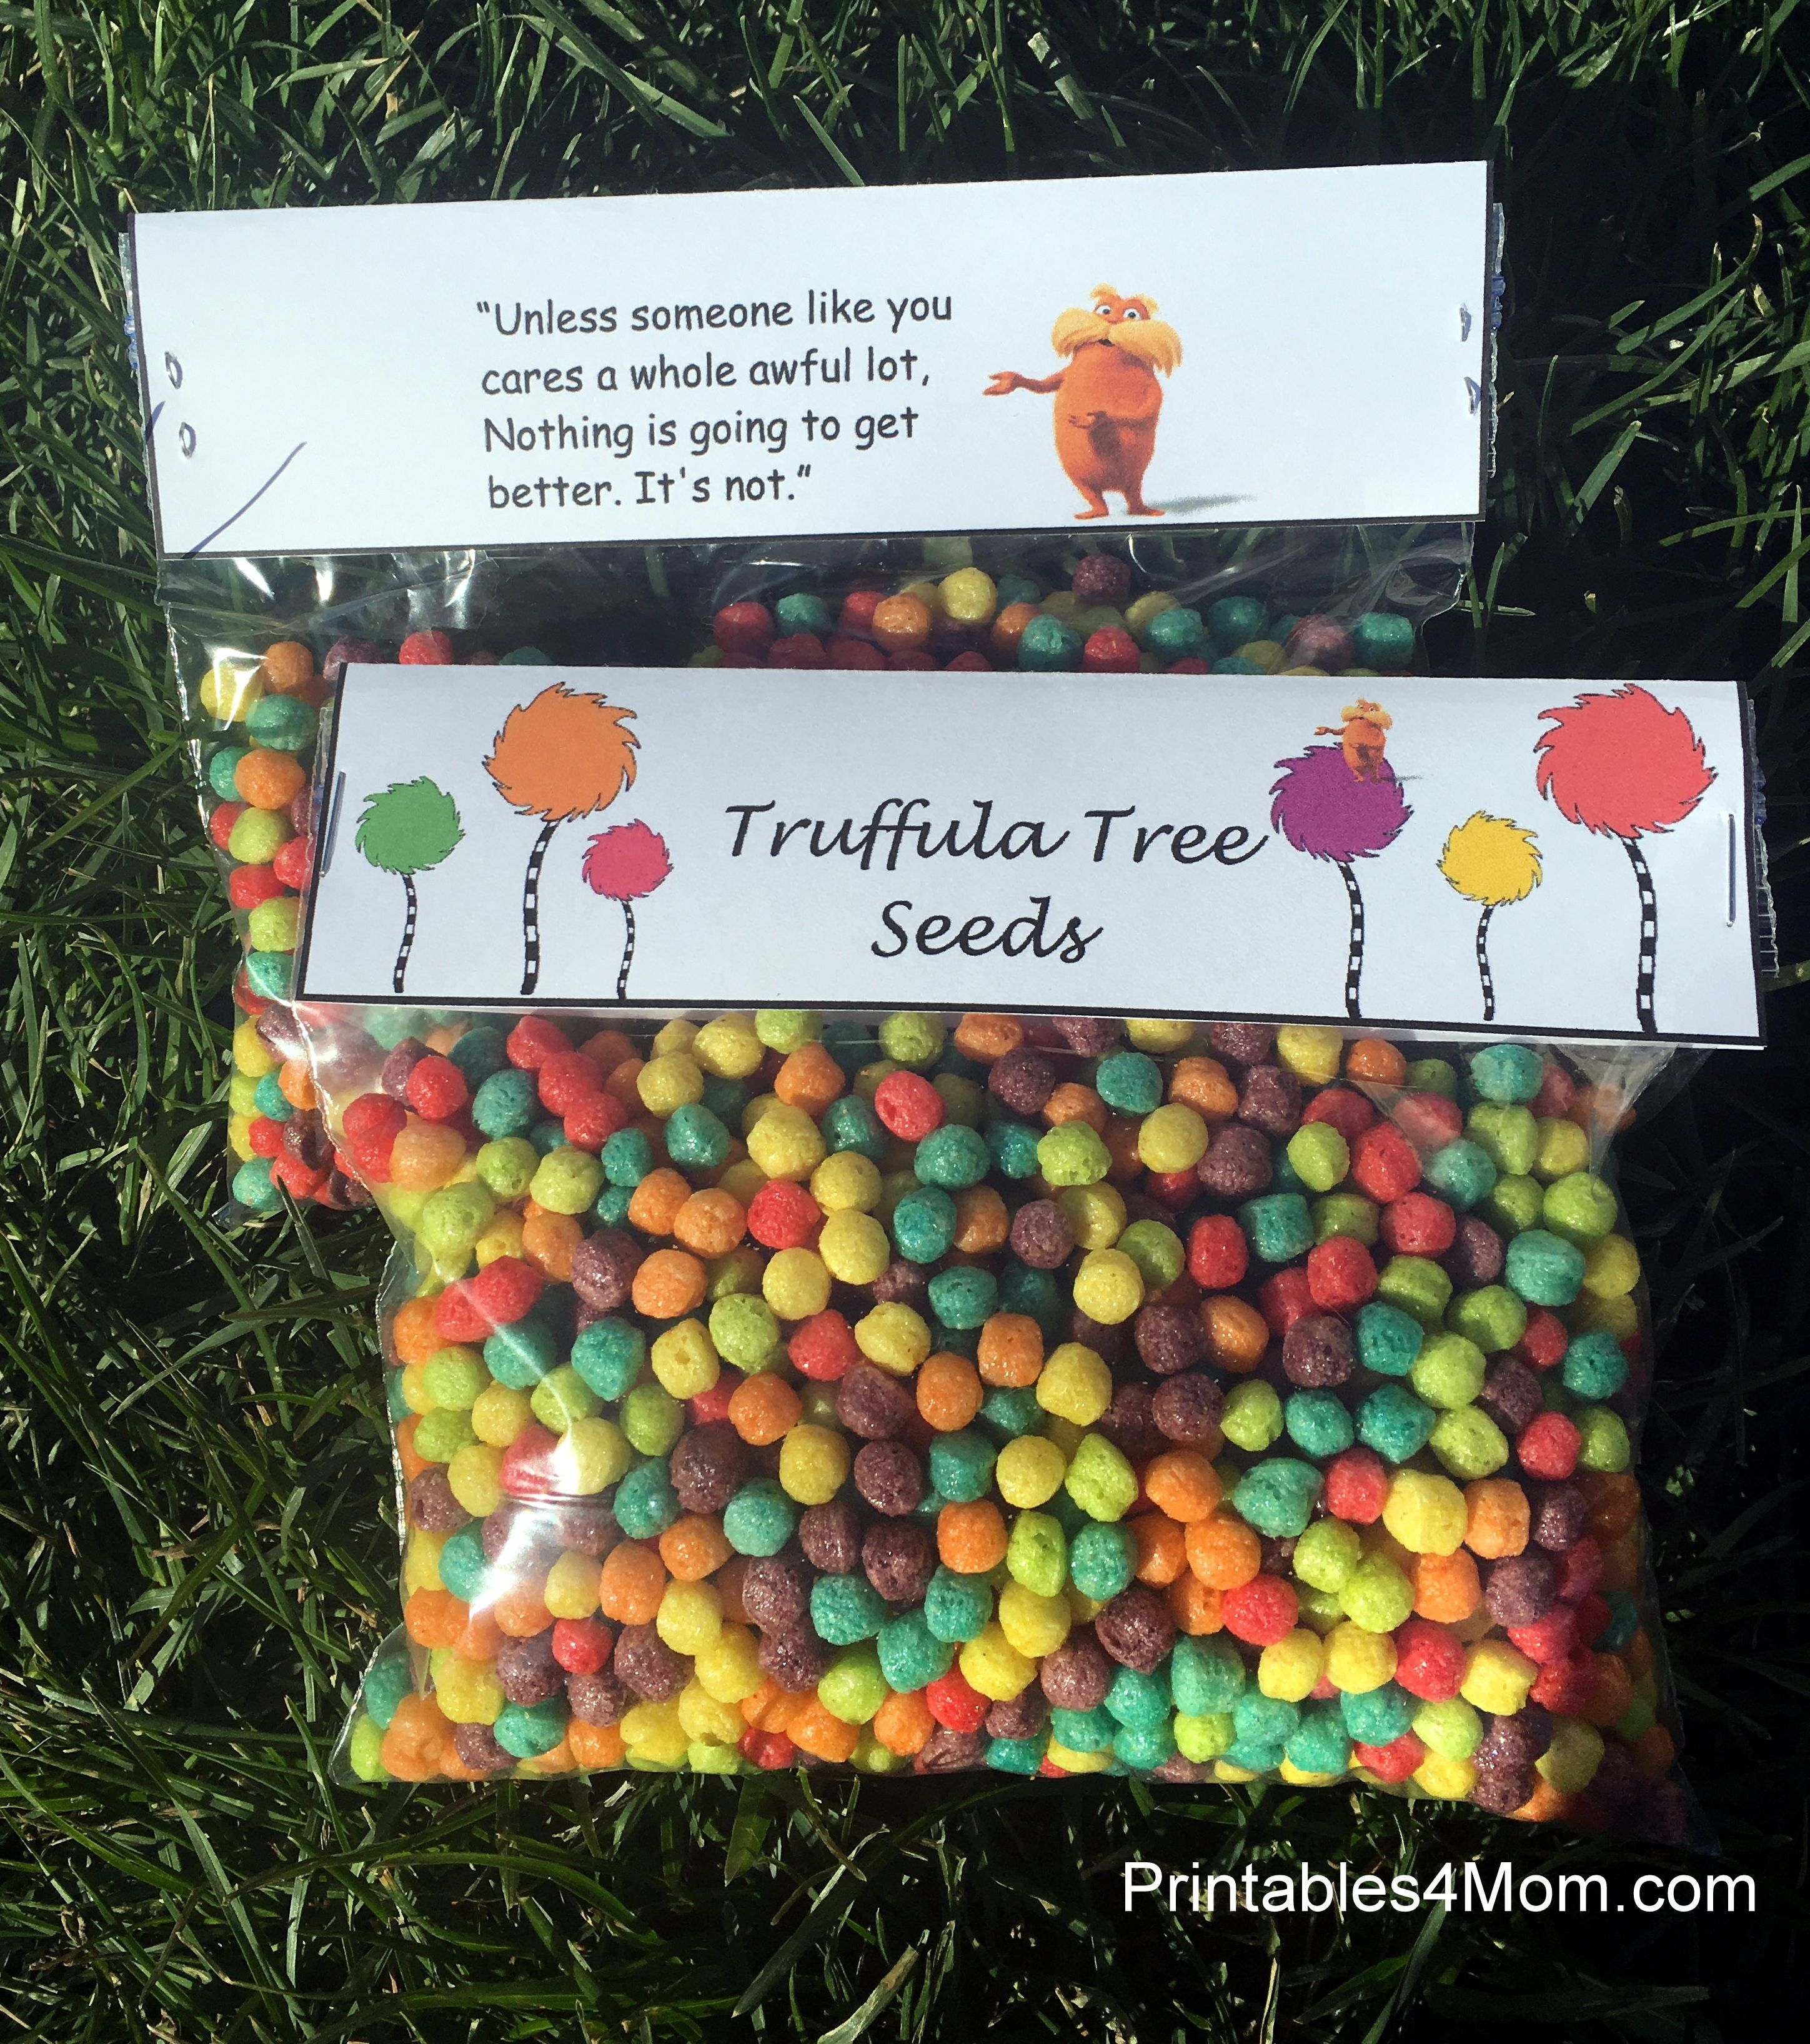 photograph regarding Truffula Seeds Printable referred to as Truffula Tree Seeds Printable Toppers Effort and hard work things Dr